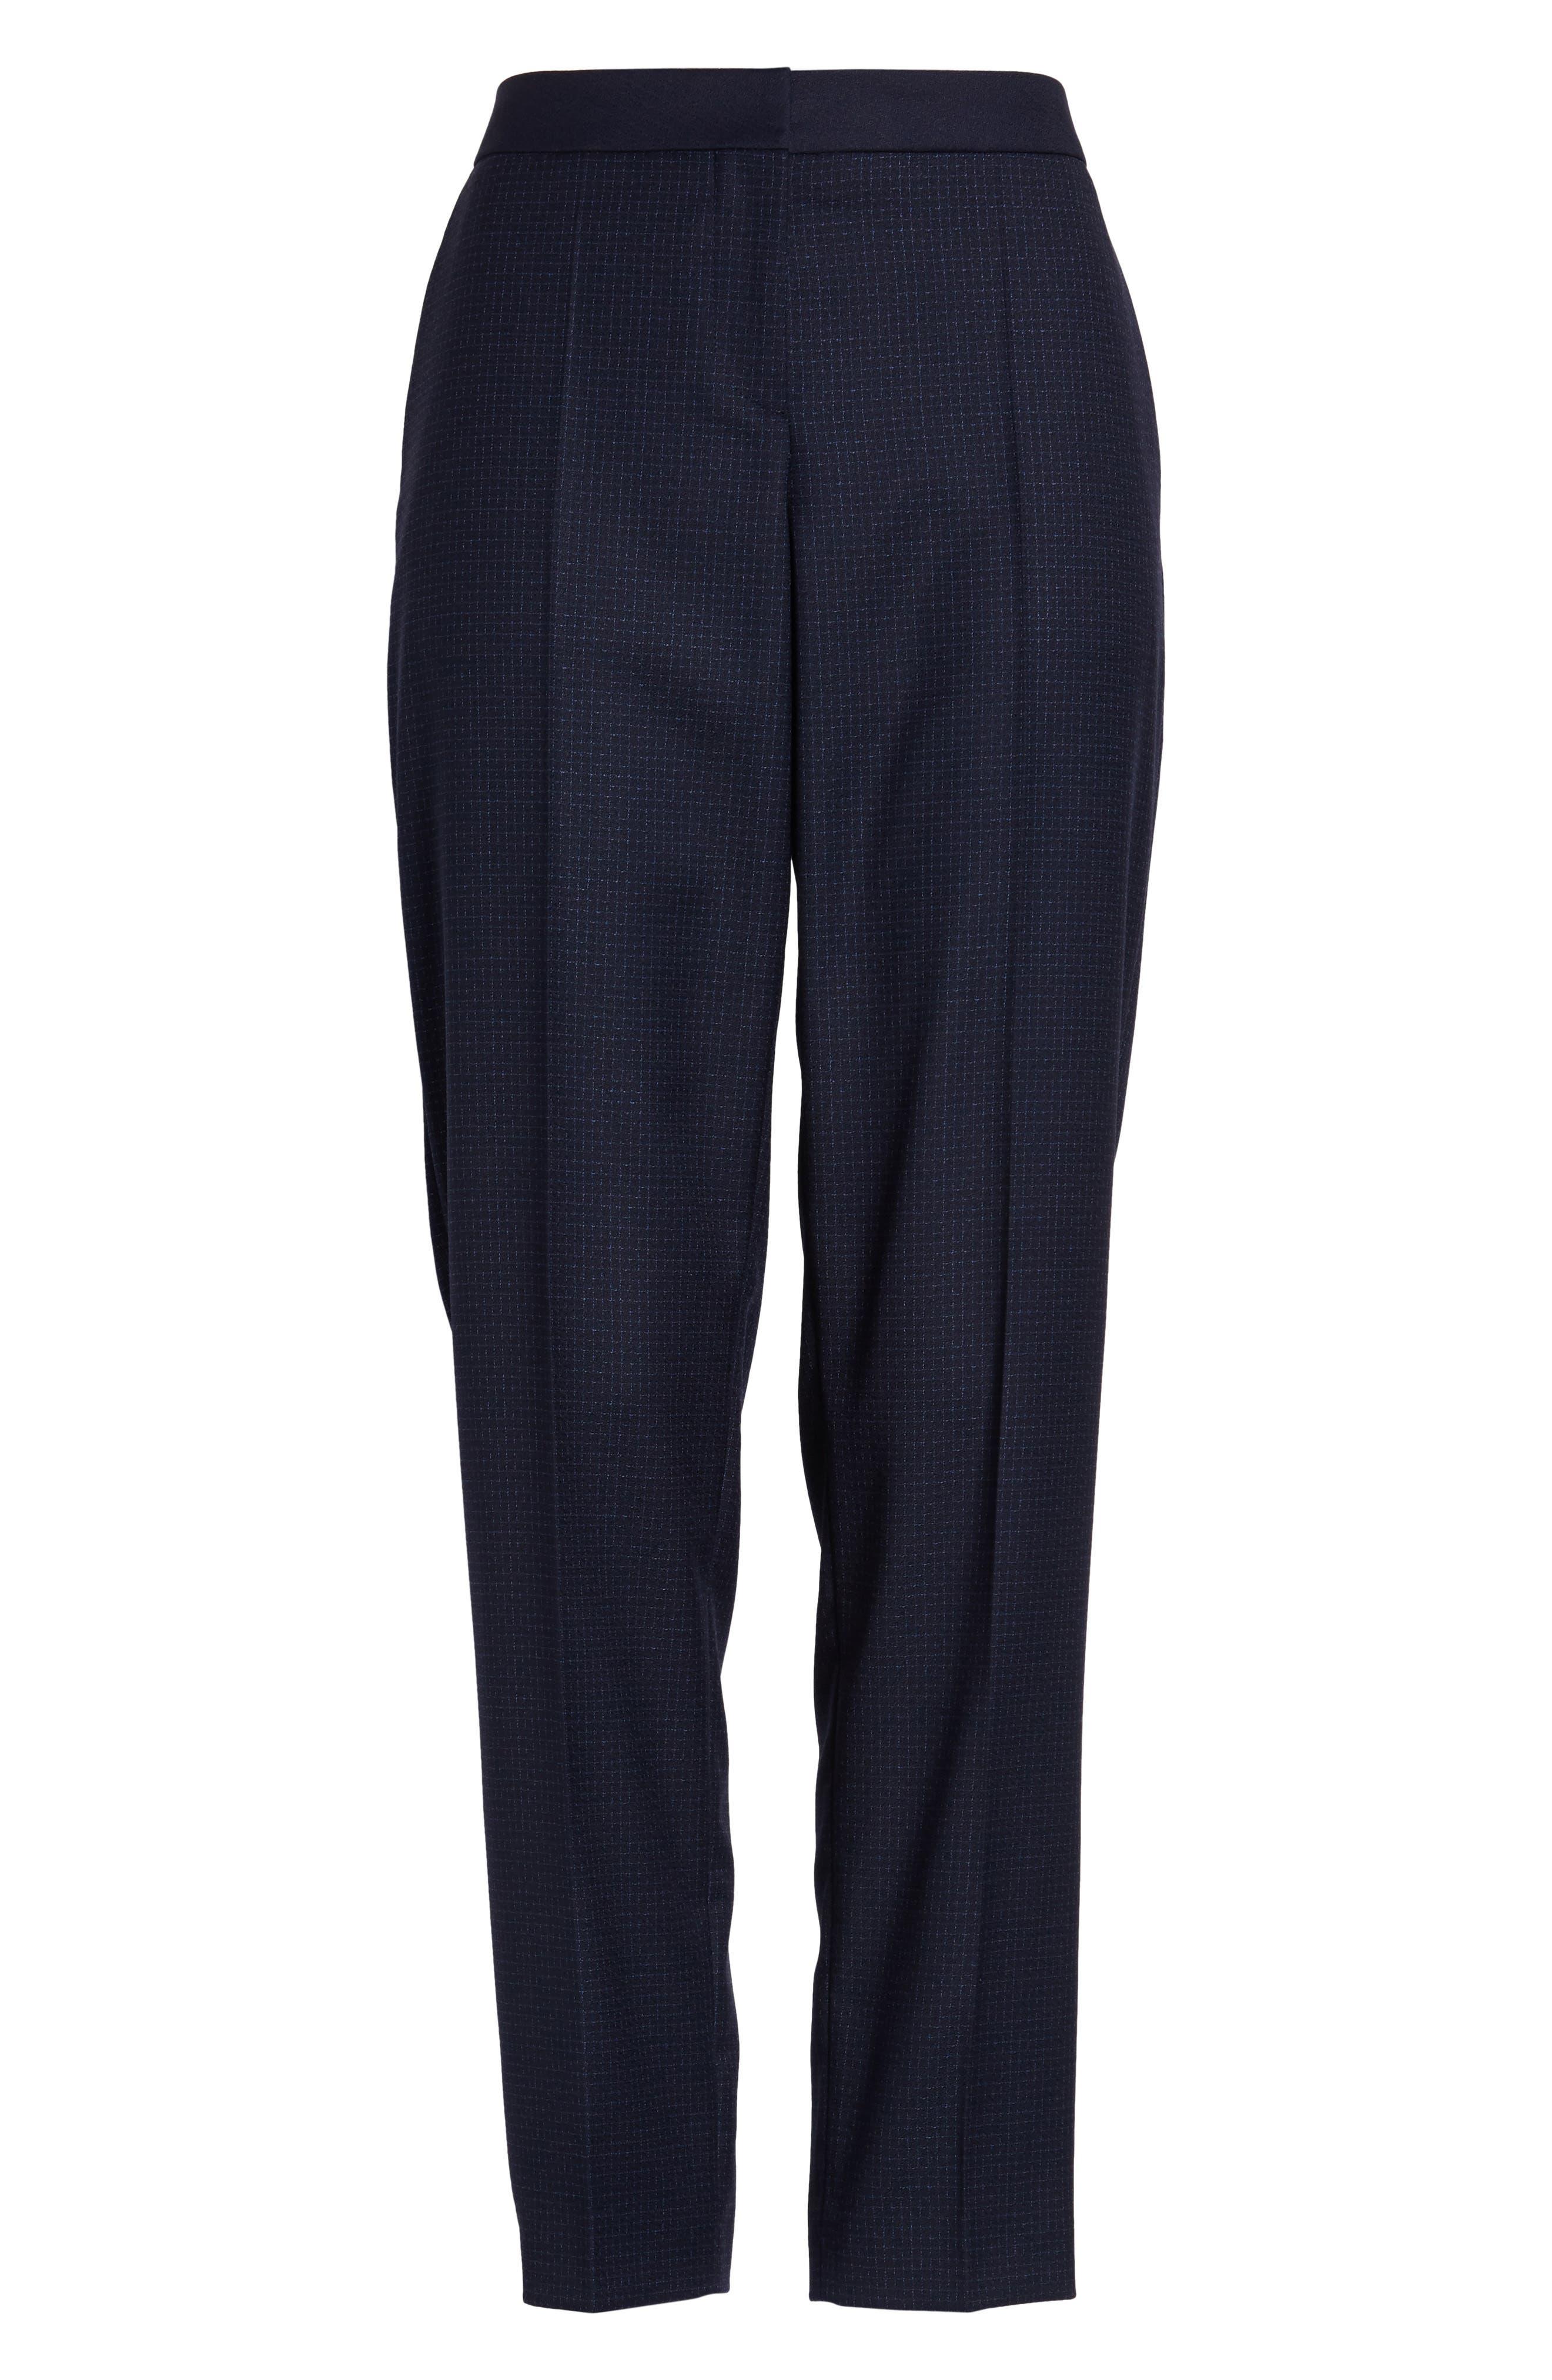 Tiluna Windowpane Slim Leg Trousers,                             Alternate thumbnail 6, color,